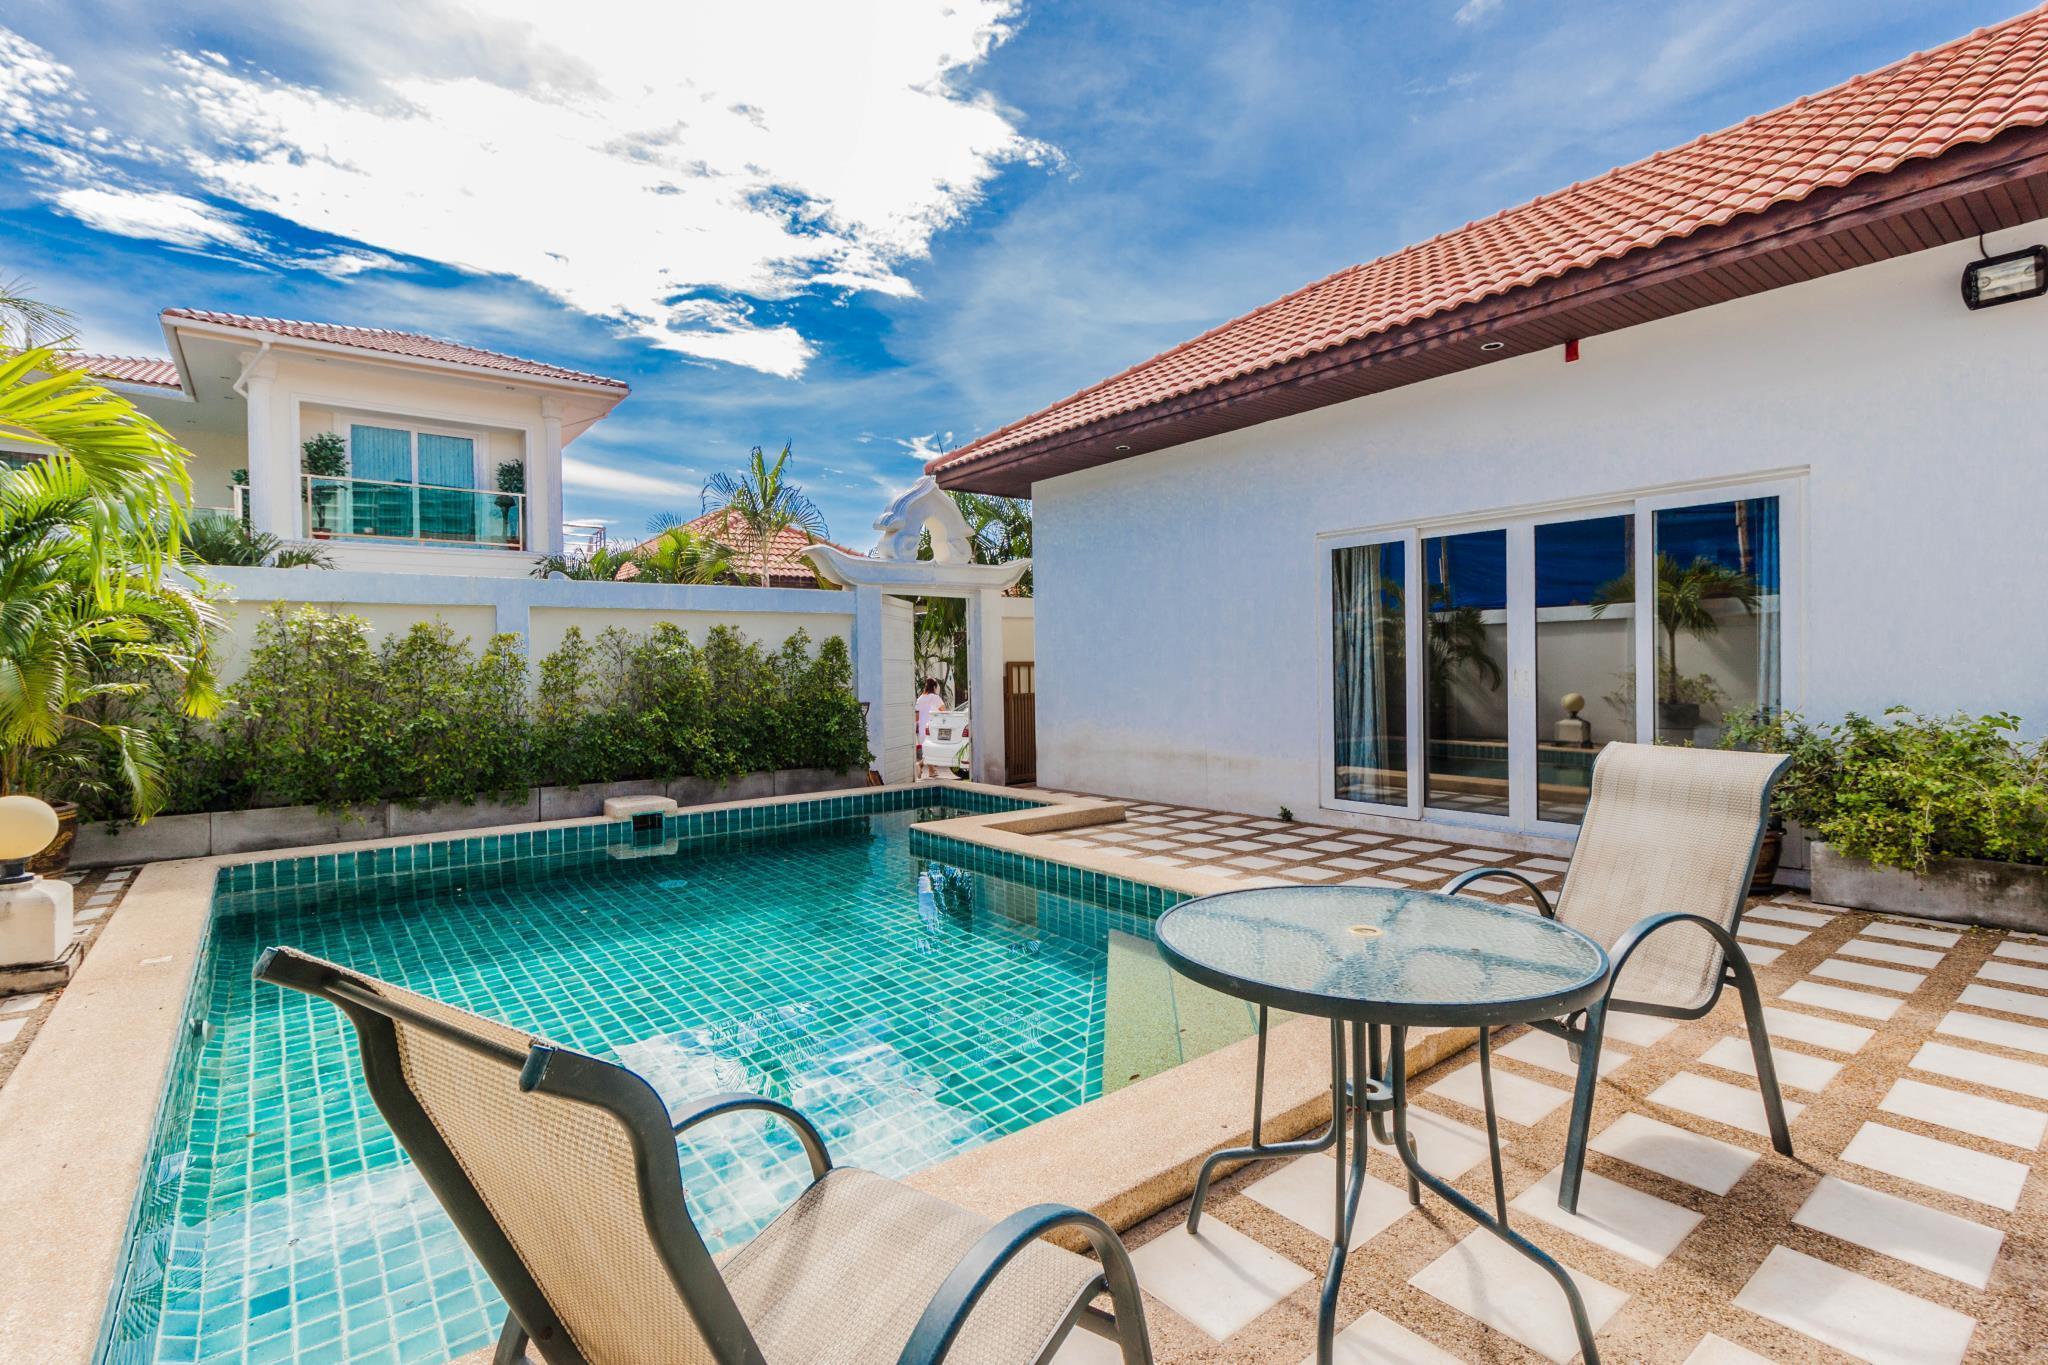 Majestic Pool Villa By Pattaya Sunny Rentals มาเจสติก พูล วิลลา บาย พัทยา ซันนี เรนทัล